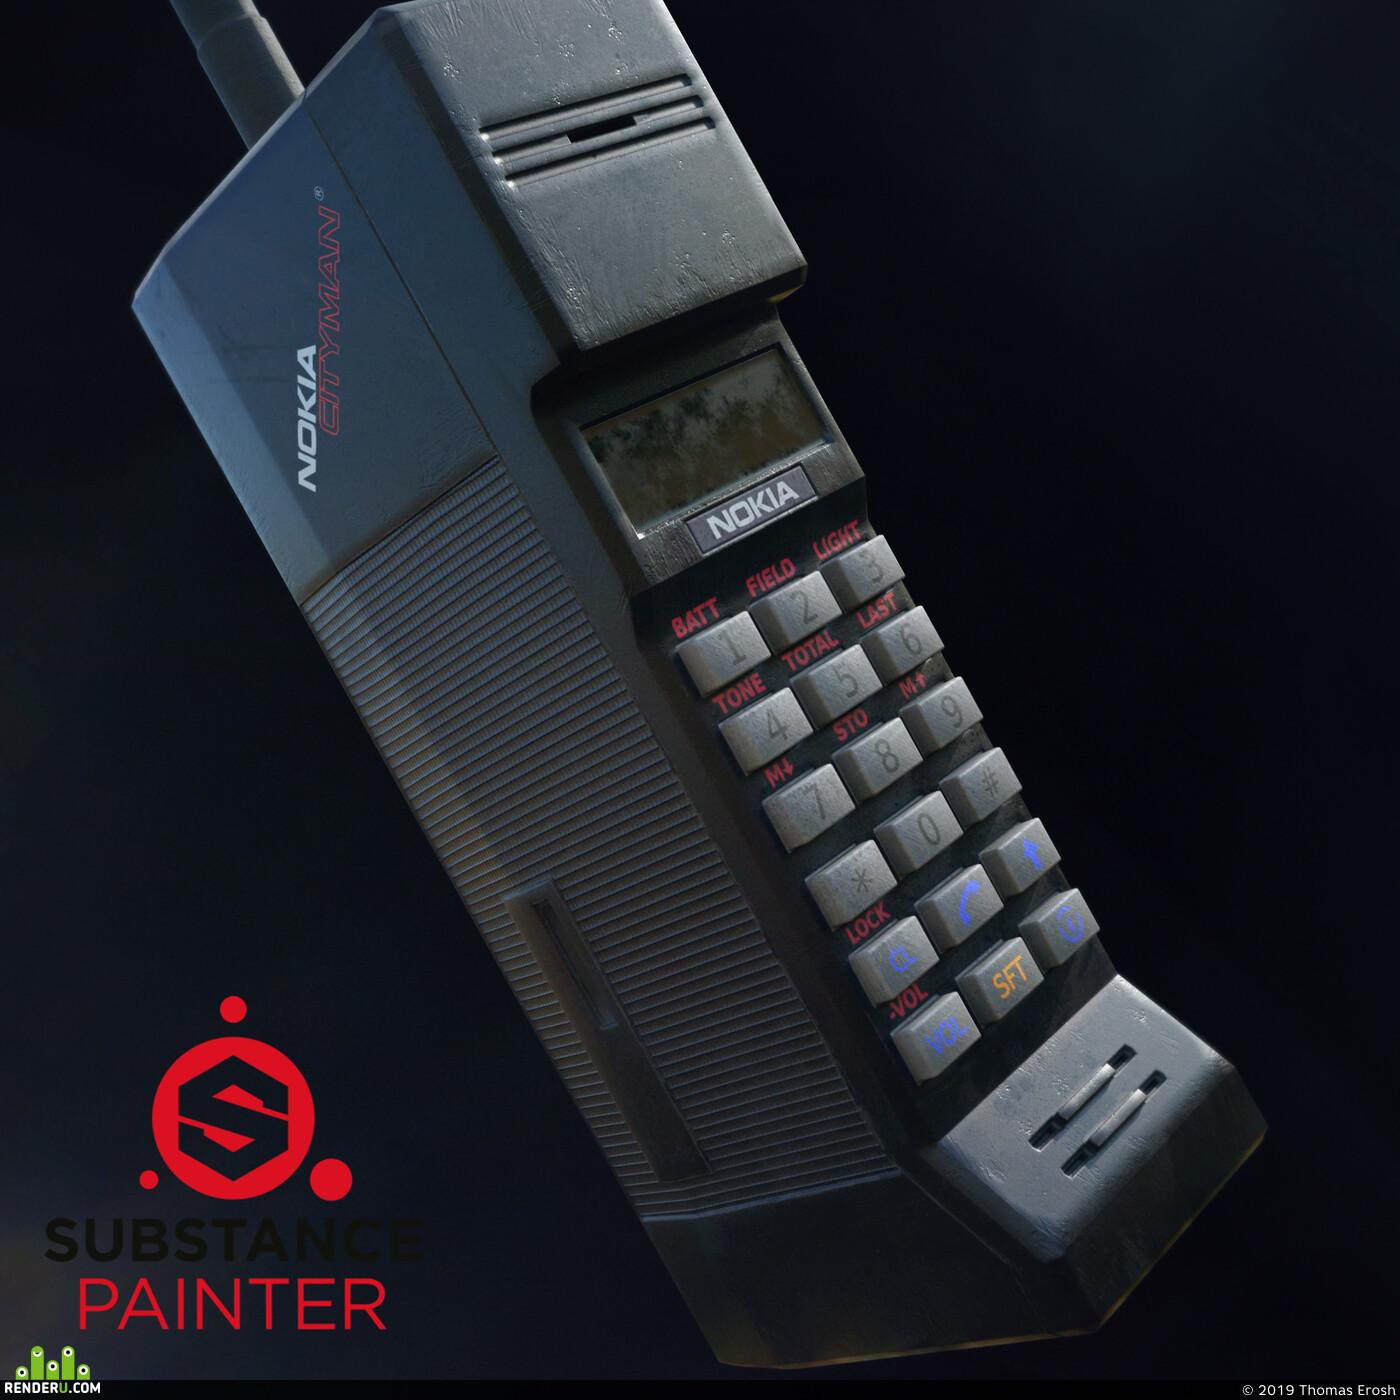 3d, Artist, mobile, Phone, textures, substance, Game prop, Props, tech